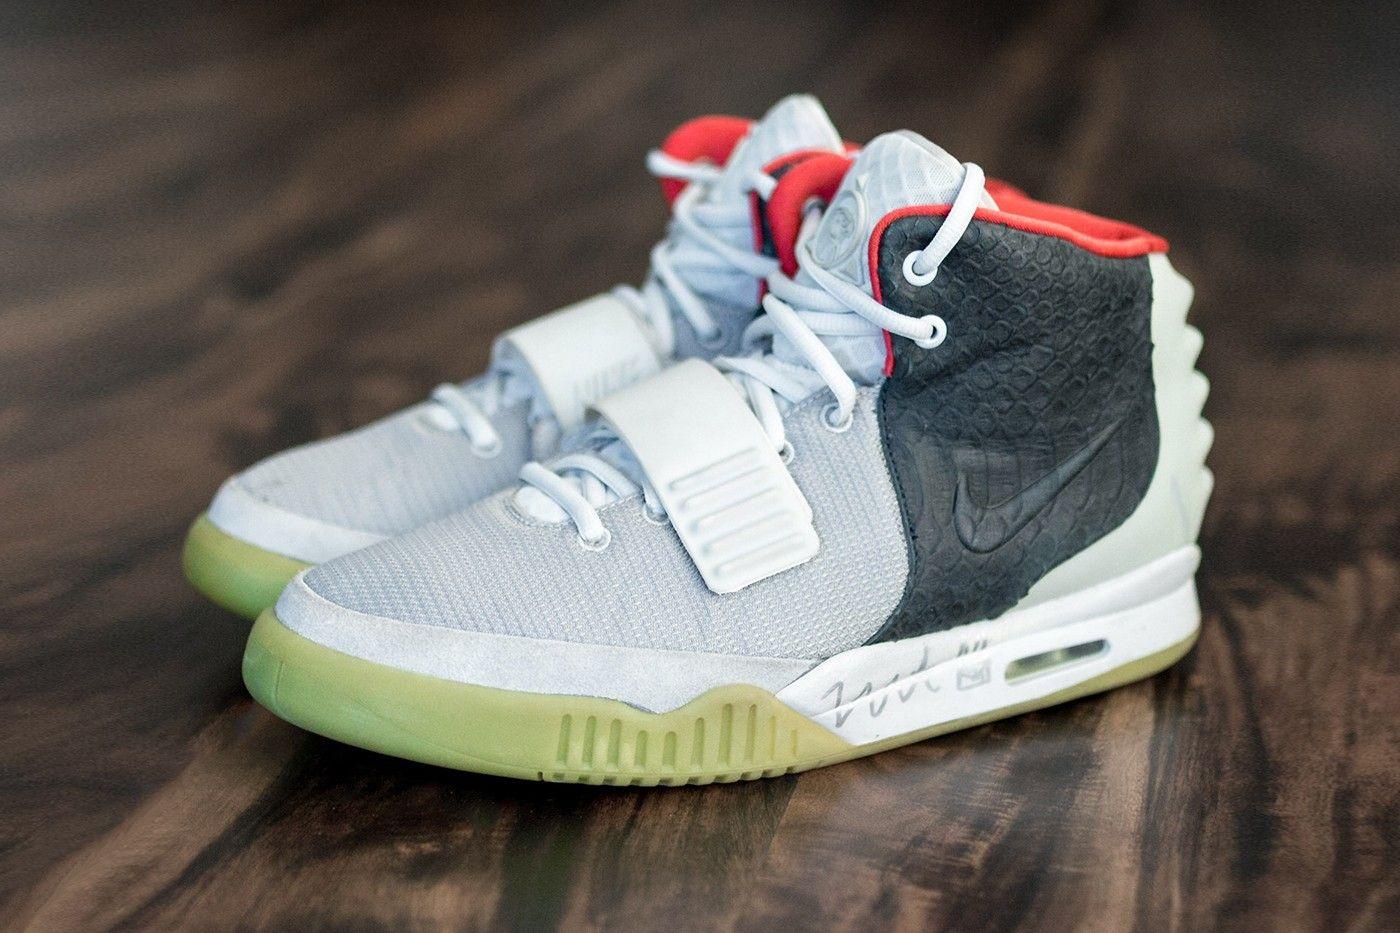 Nike Air Yeezy 2 'Mismatch' Sample